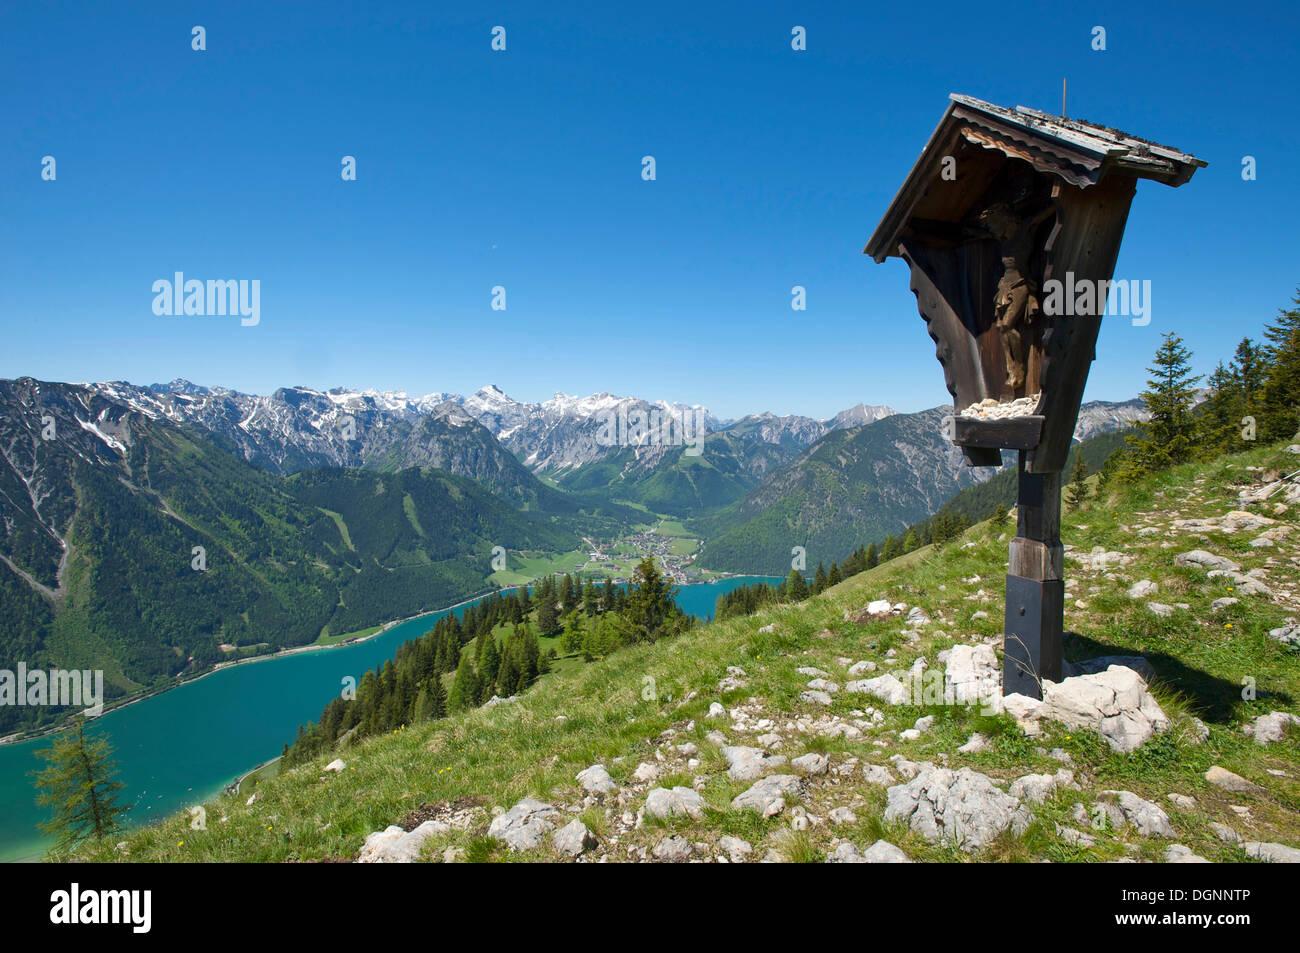 View of Lake Achensee as seen from Durrakreuz viewpoint, Tyrol, Austria, Europe - Stock Image